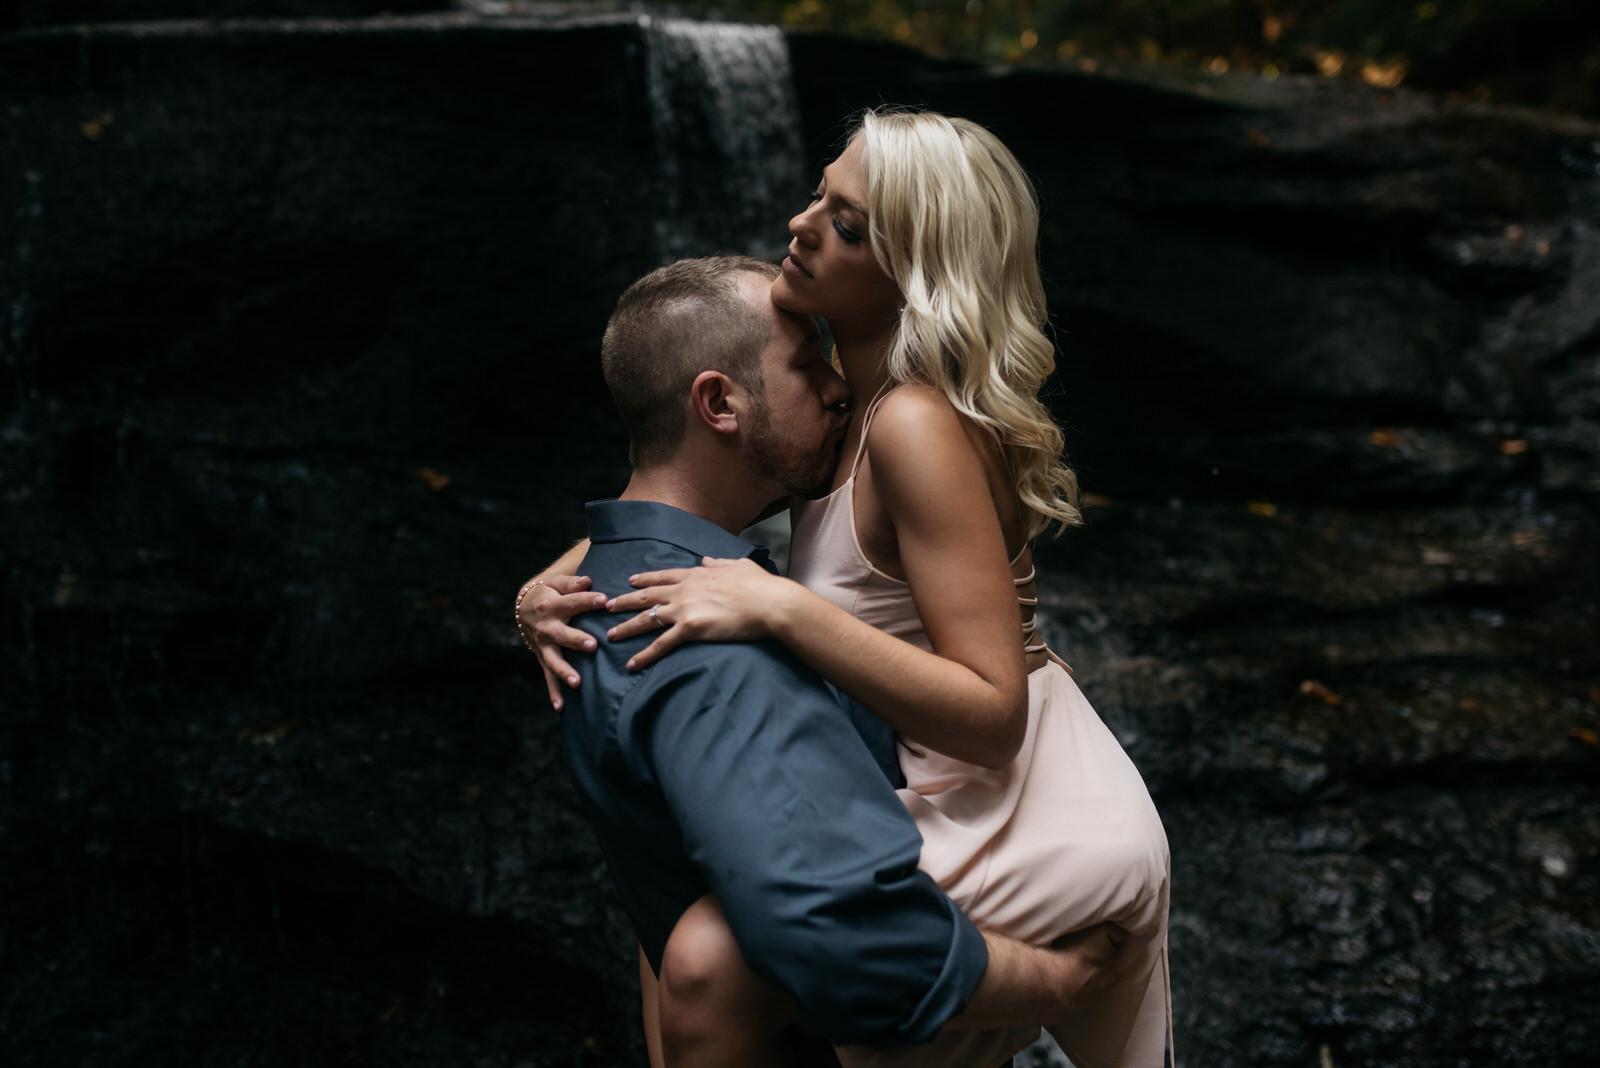 McConnells-Mill-Engagement-Photos-53.jpg